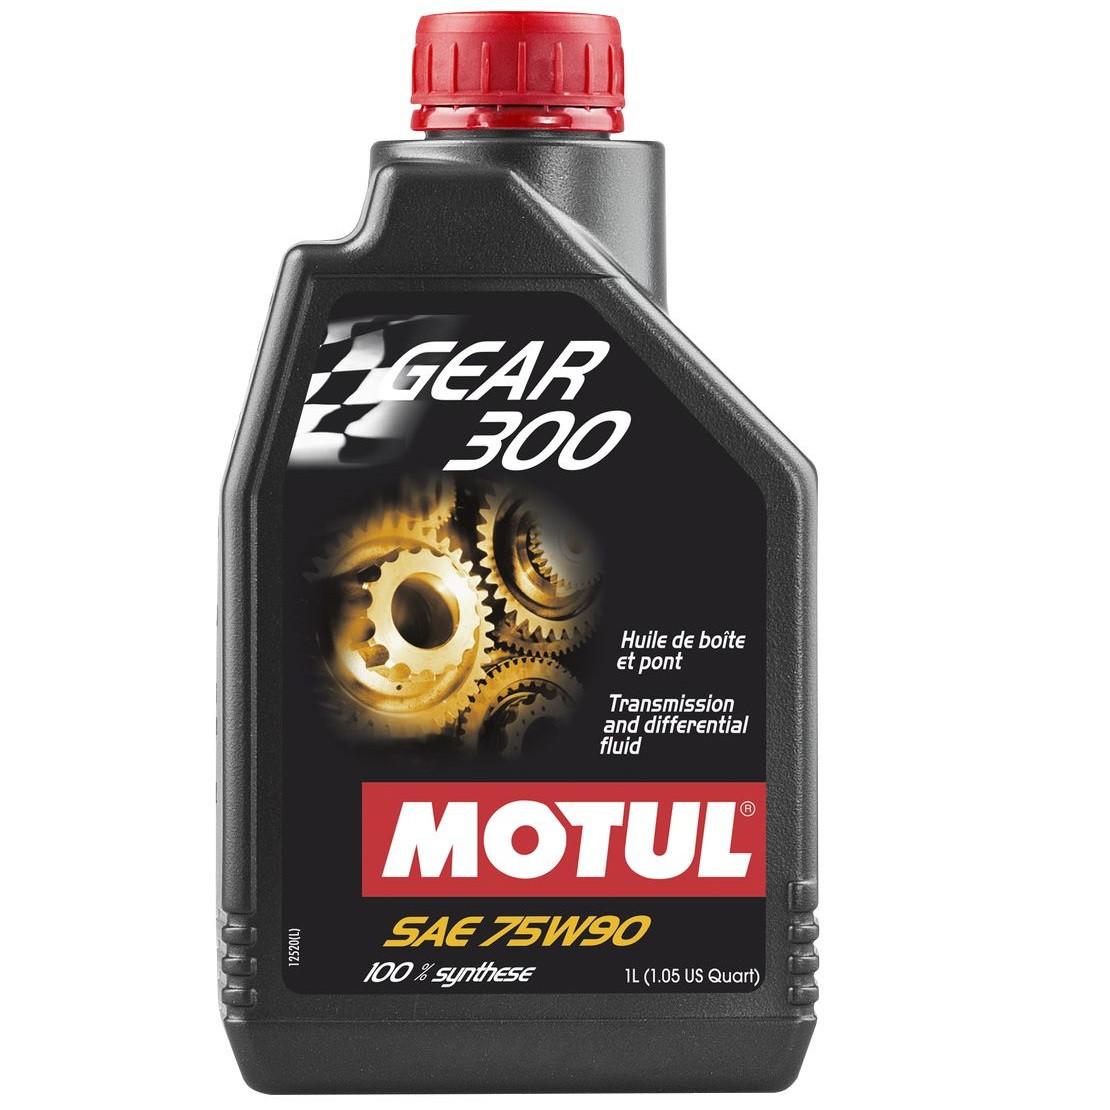 Масло трансмісійне 100% синтетичне эстеровое MOTUL Gear 300 SAE 75W90 1л. 105777/317101